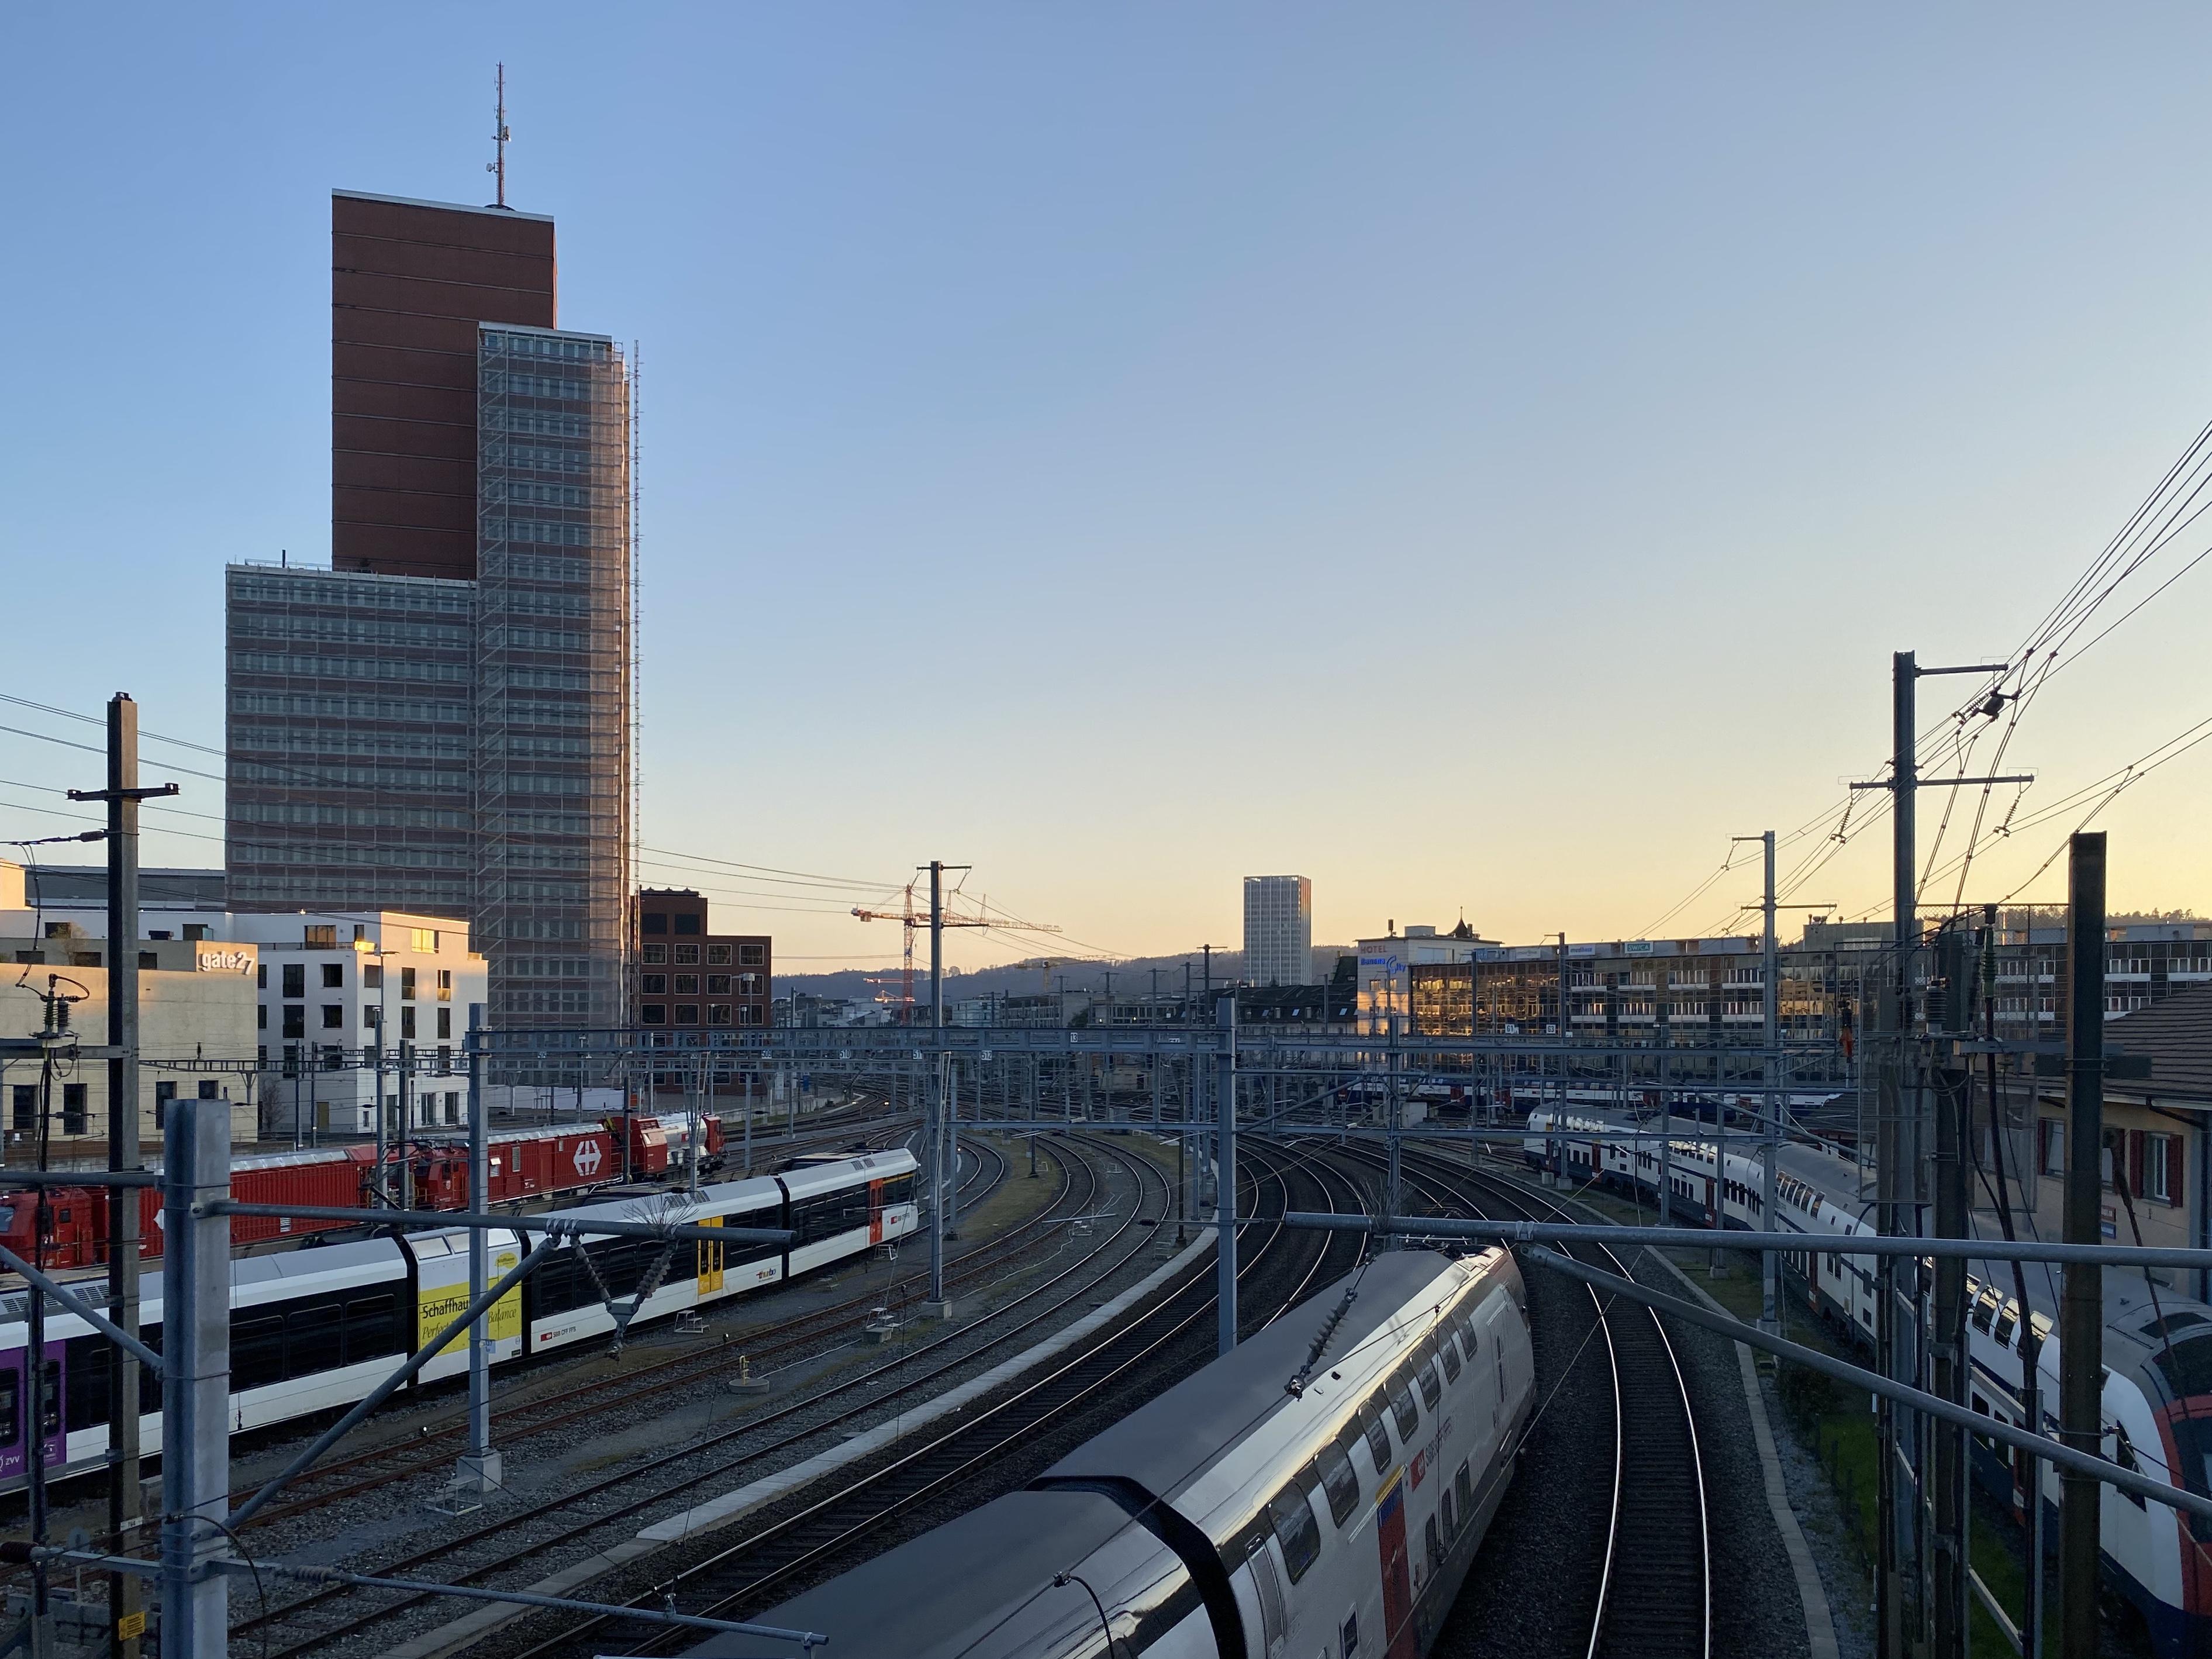 Winterthur: Roter Turm bleibt eingerüstet